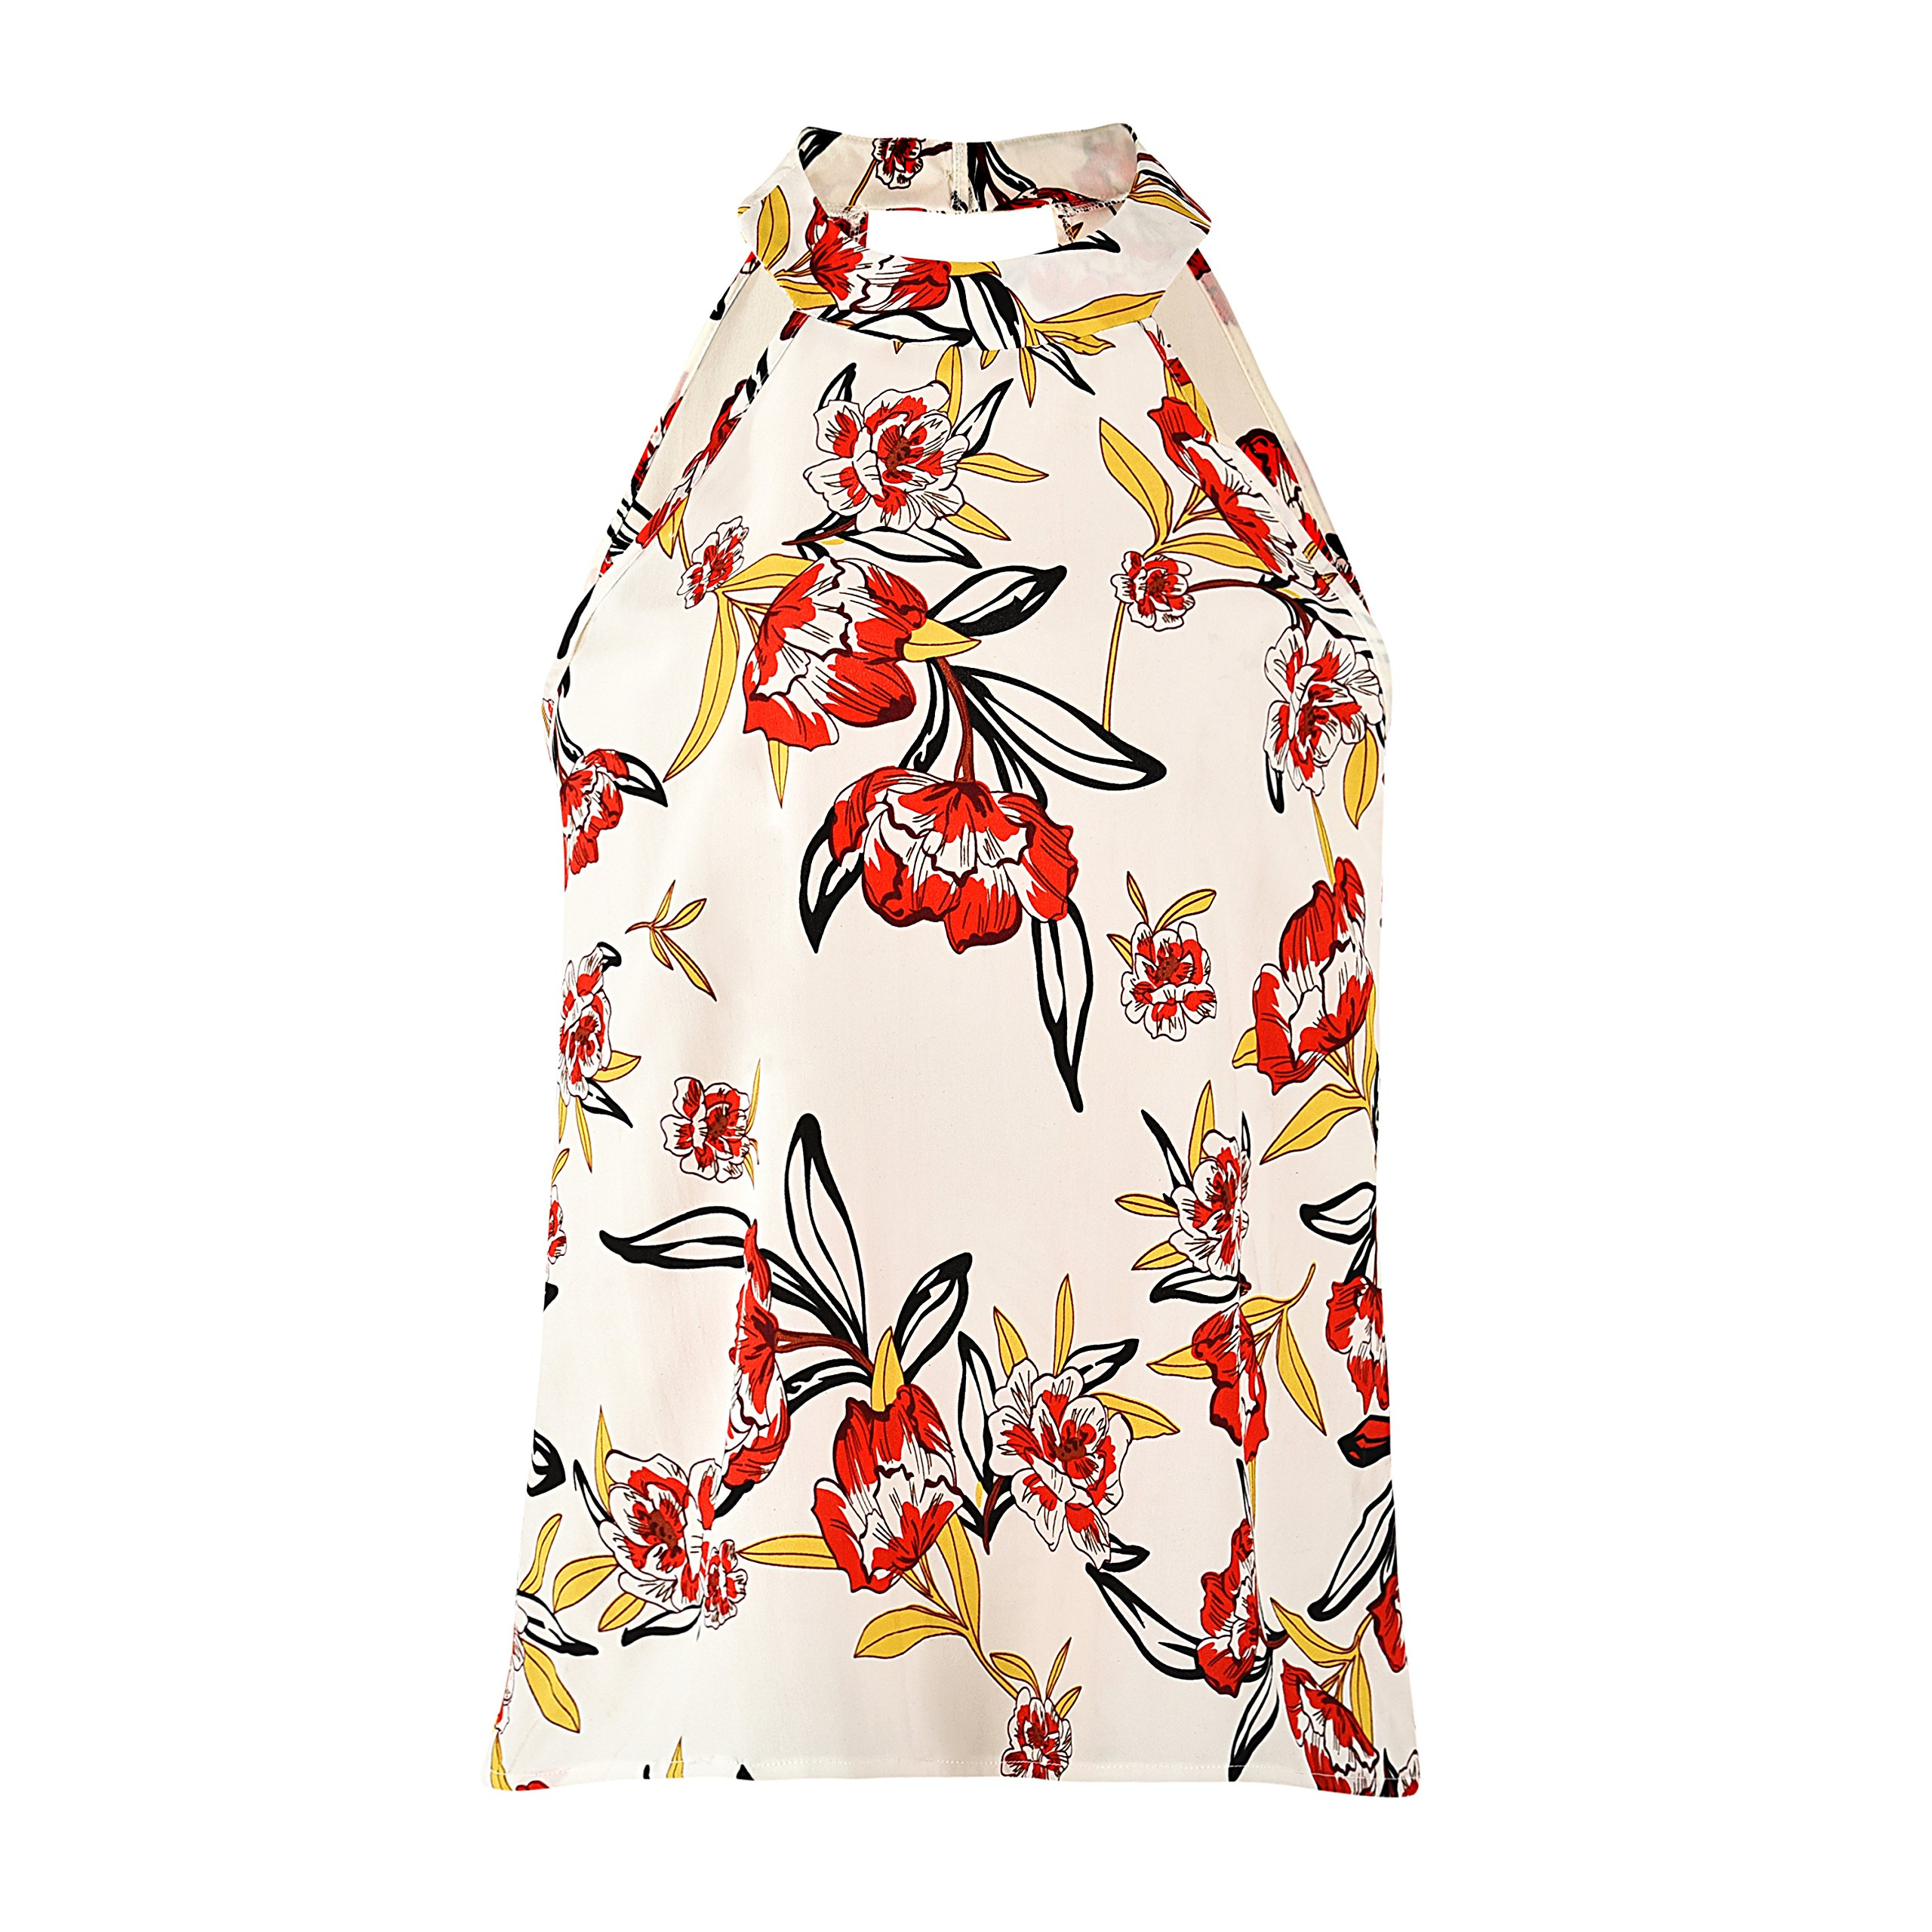 Comcrib Womens Casual Floral Printed Sleeveless Vest Shirt, Ladies Tank Top Blouse Tunic Tops Summer Beachwear T-Shirt by Comcrib (Image #1)